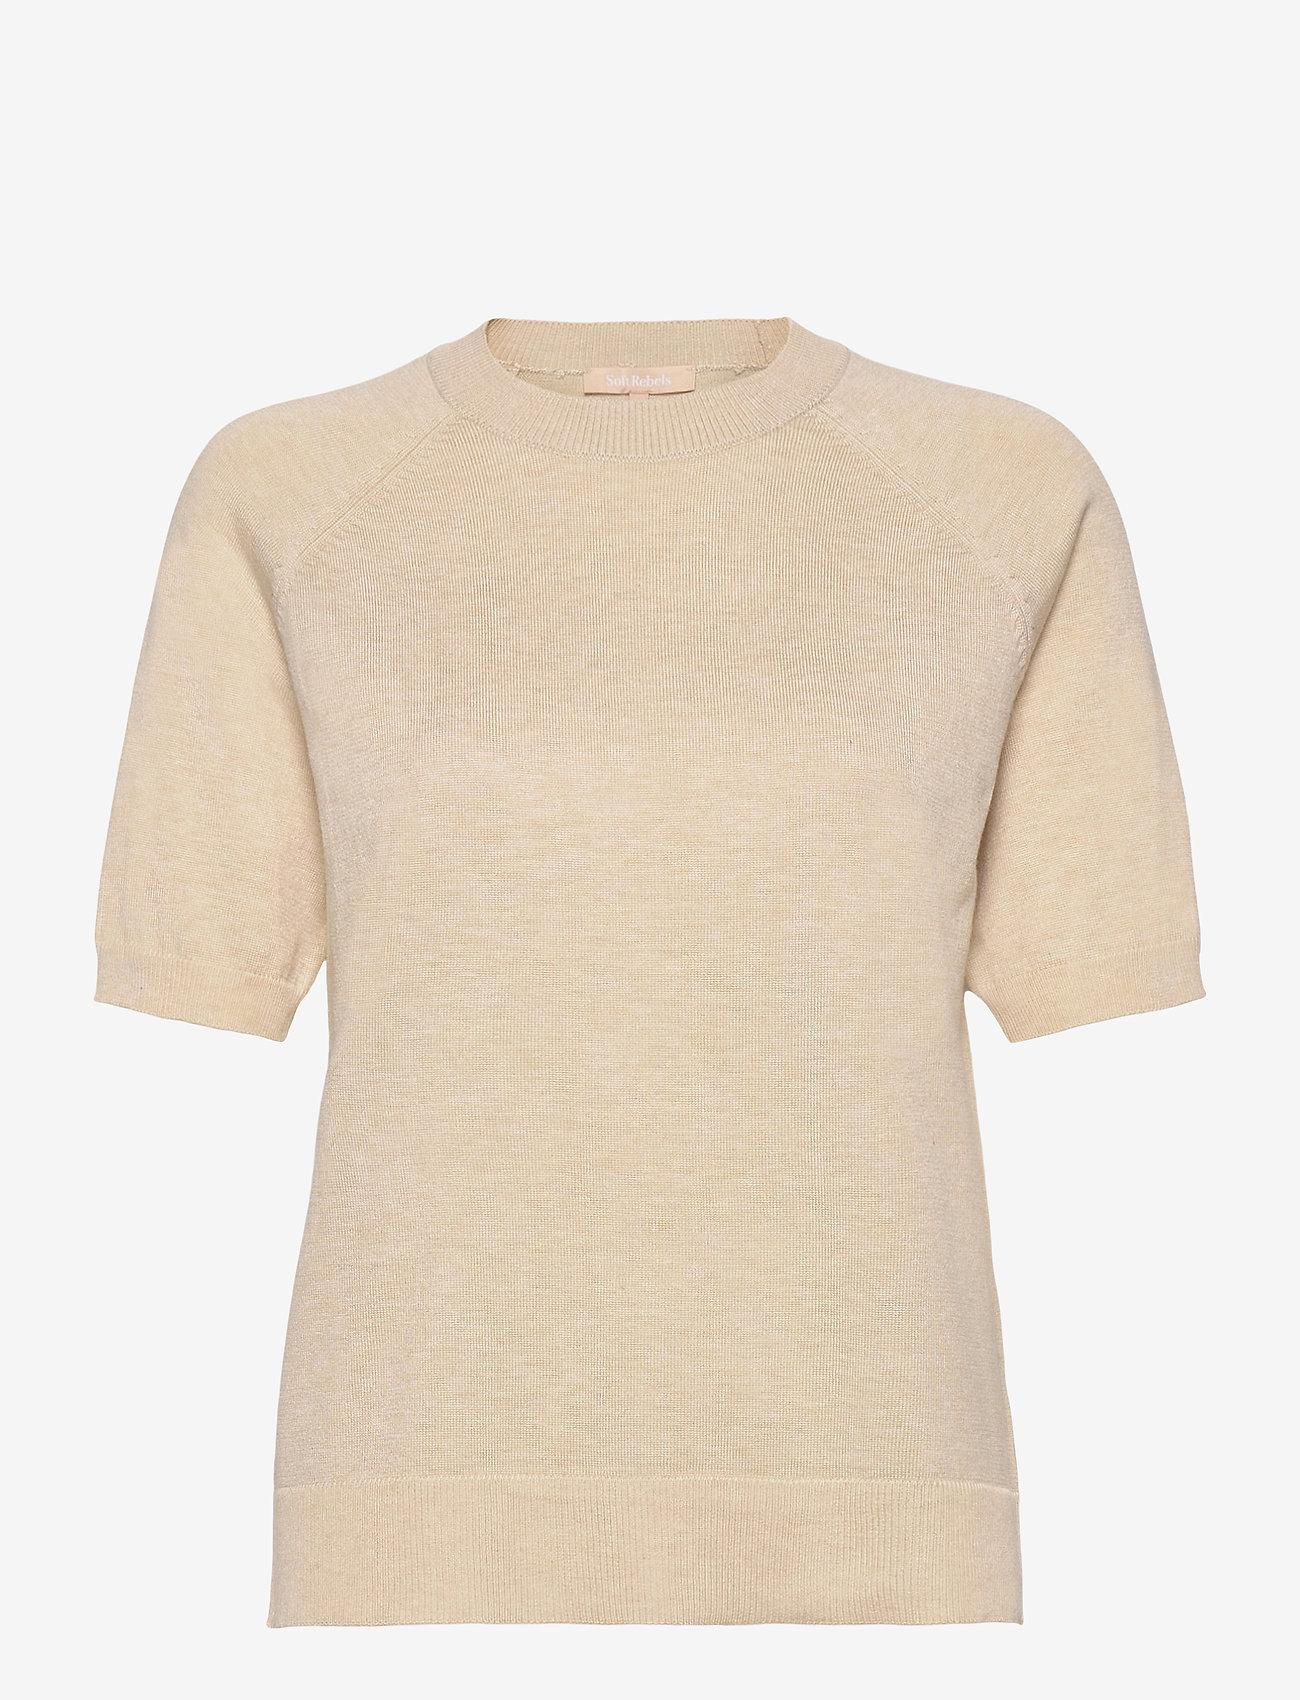 Soft Rebels - SRMarla SS O-Neck Knit - t-shirt & tops - whitecap gray - 0